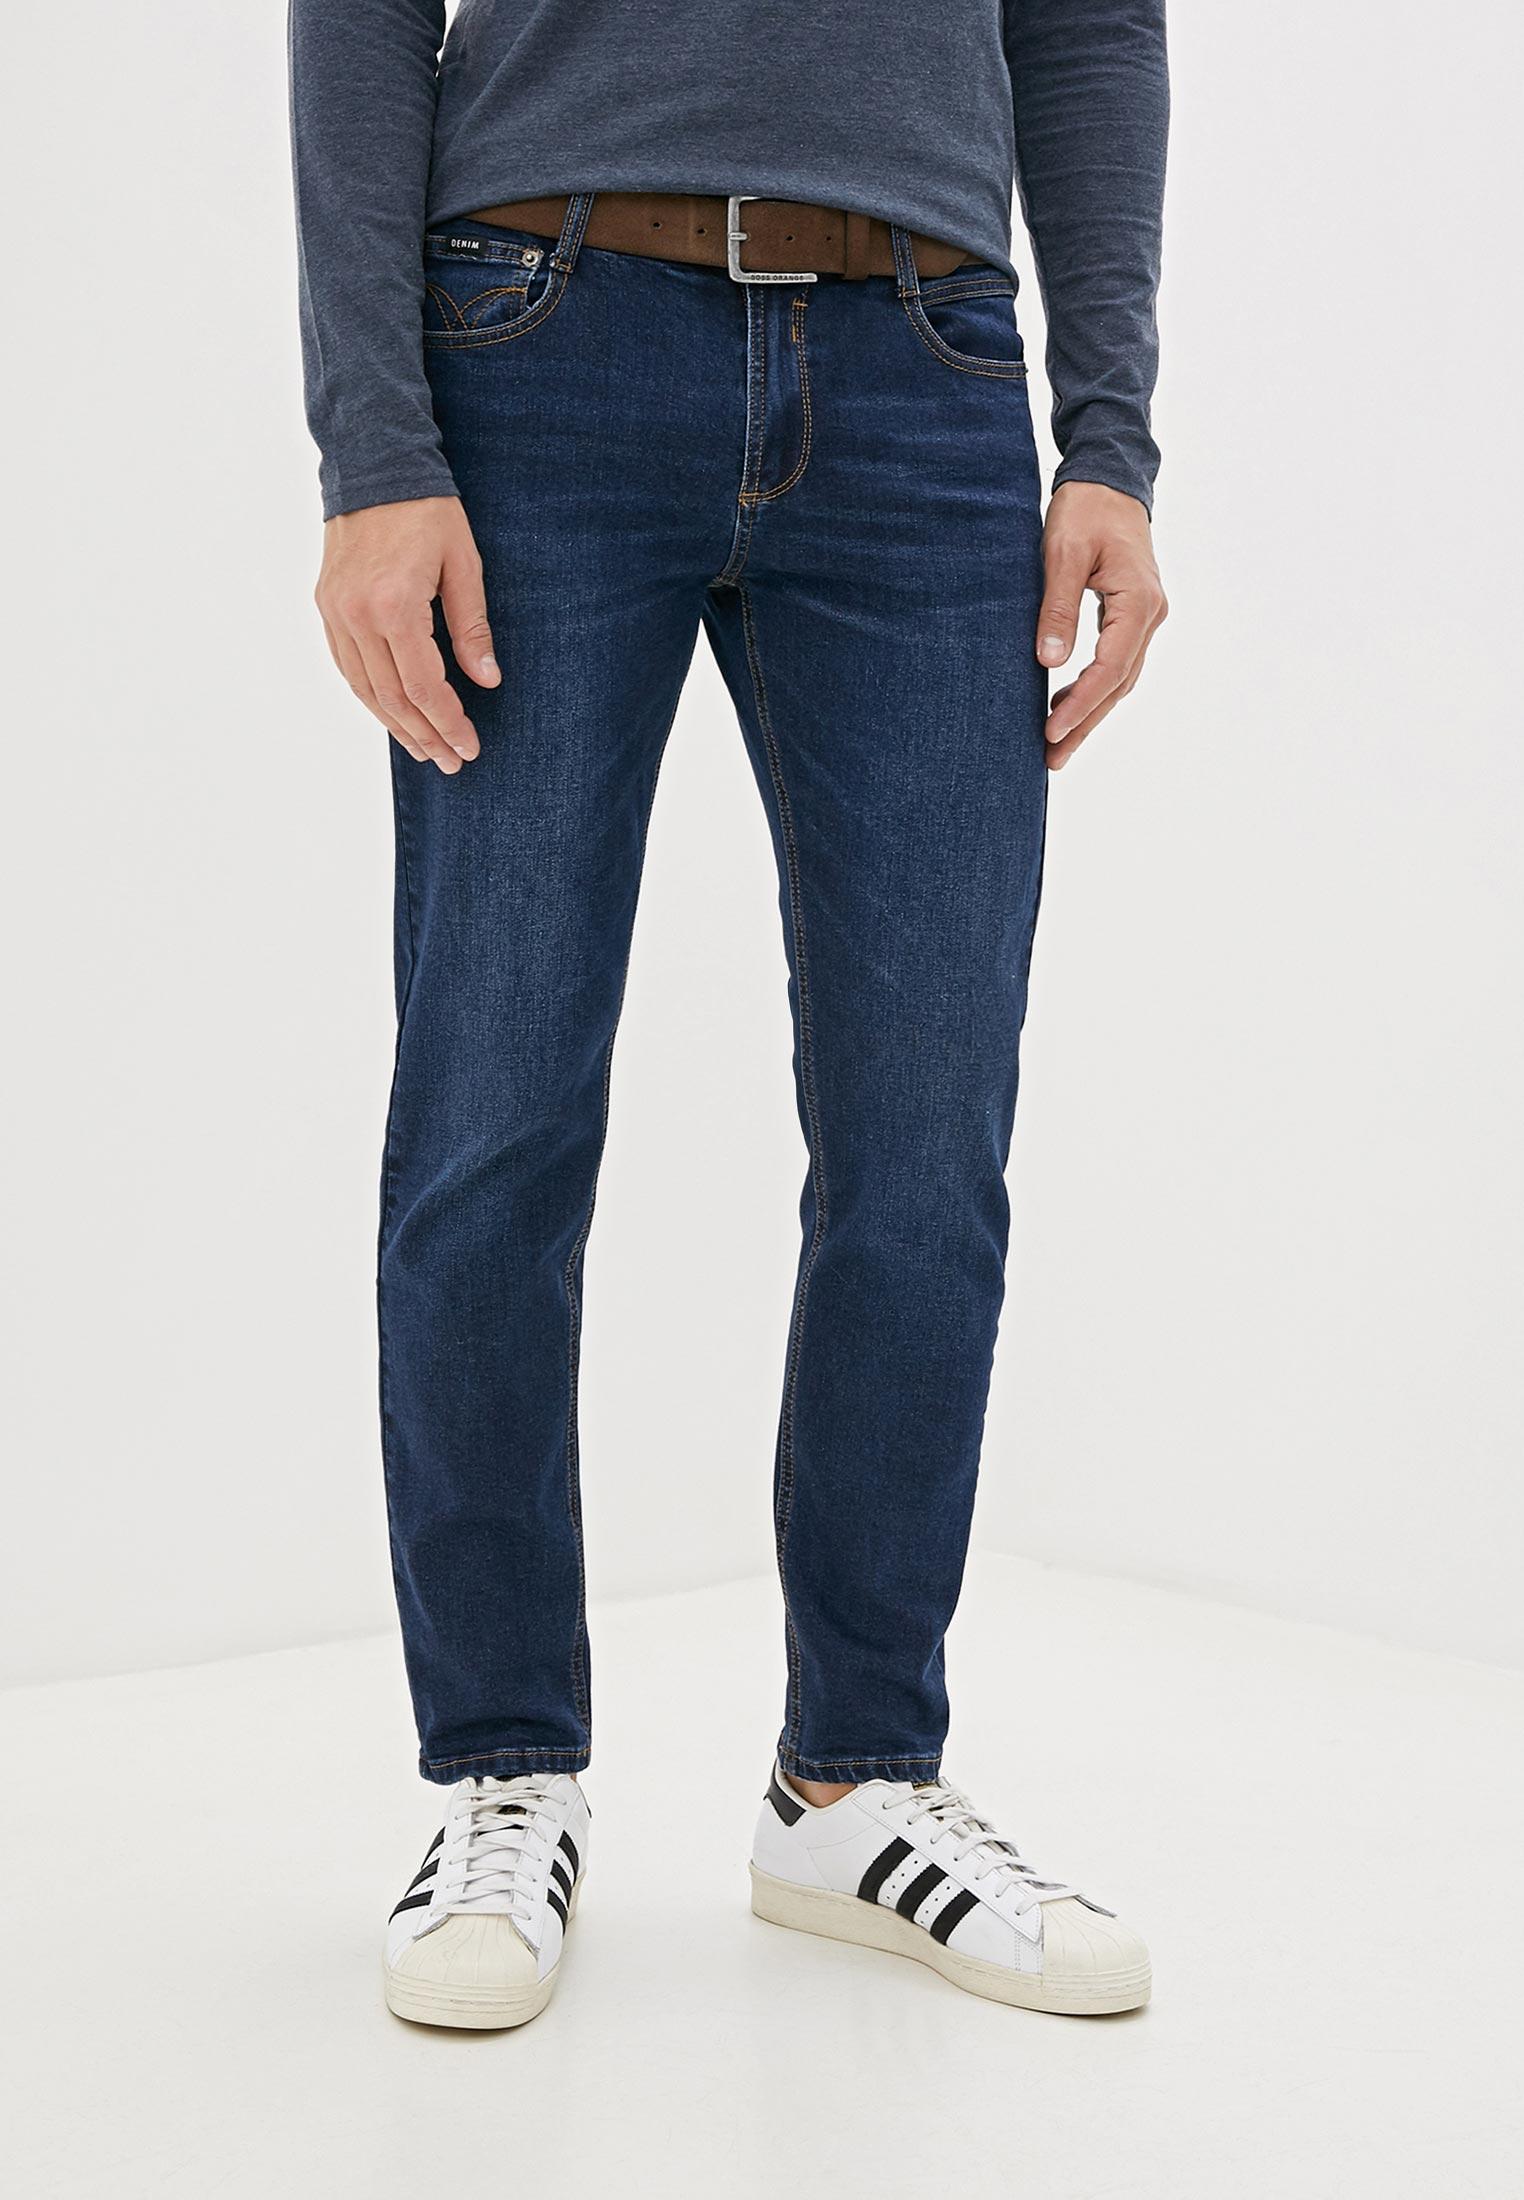 Зауженные джинсы Sela (Сэла) PJ-235/1129-9361